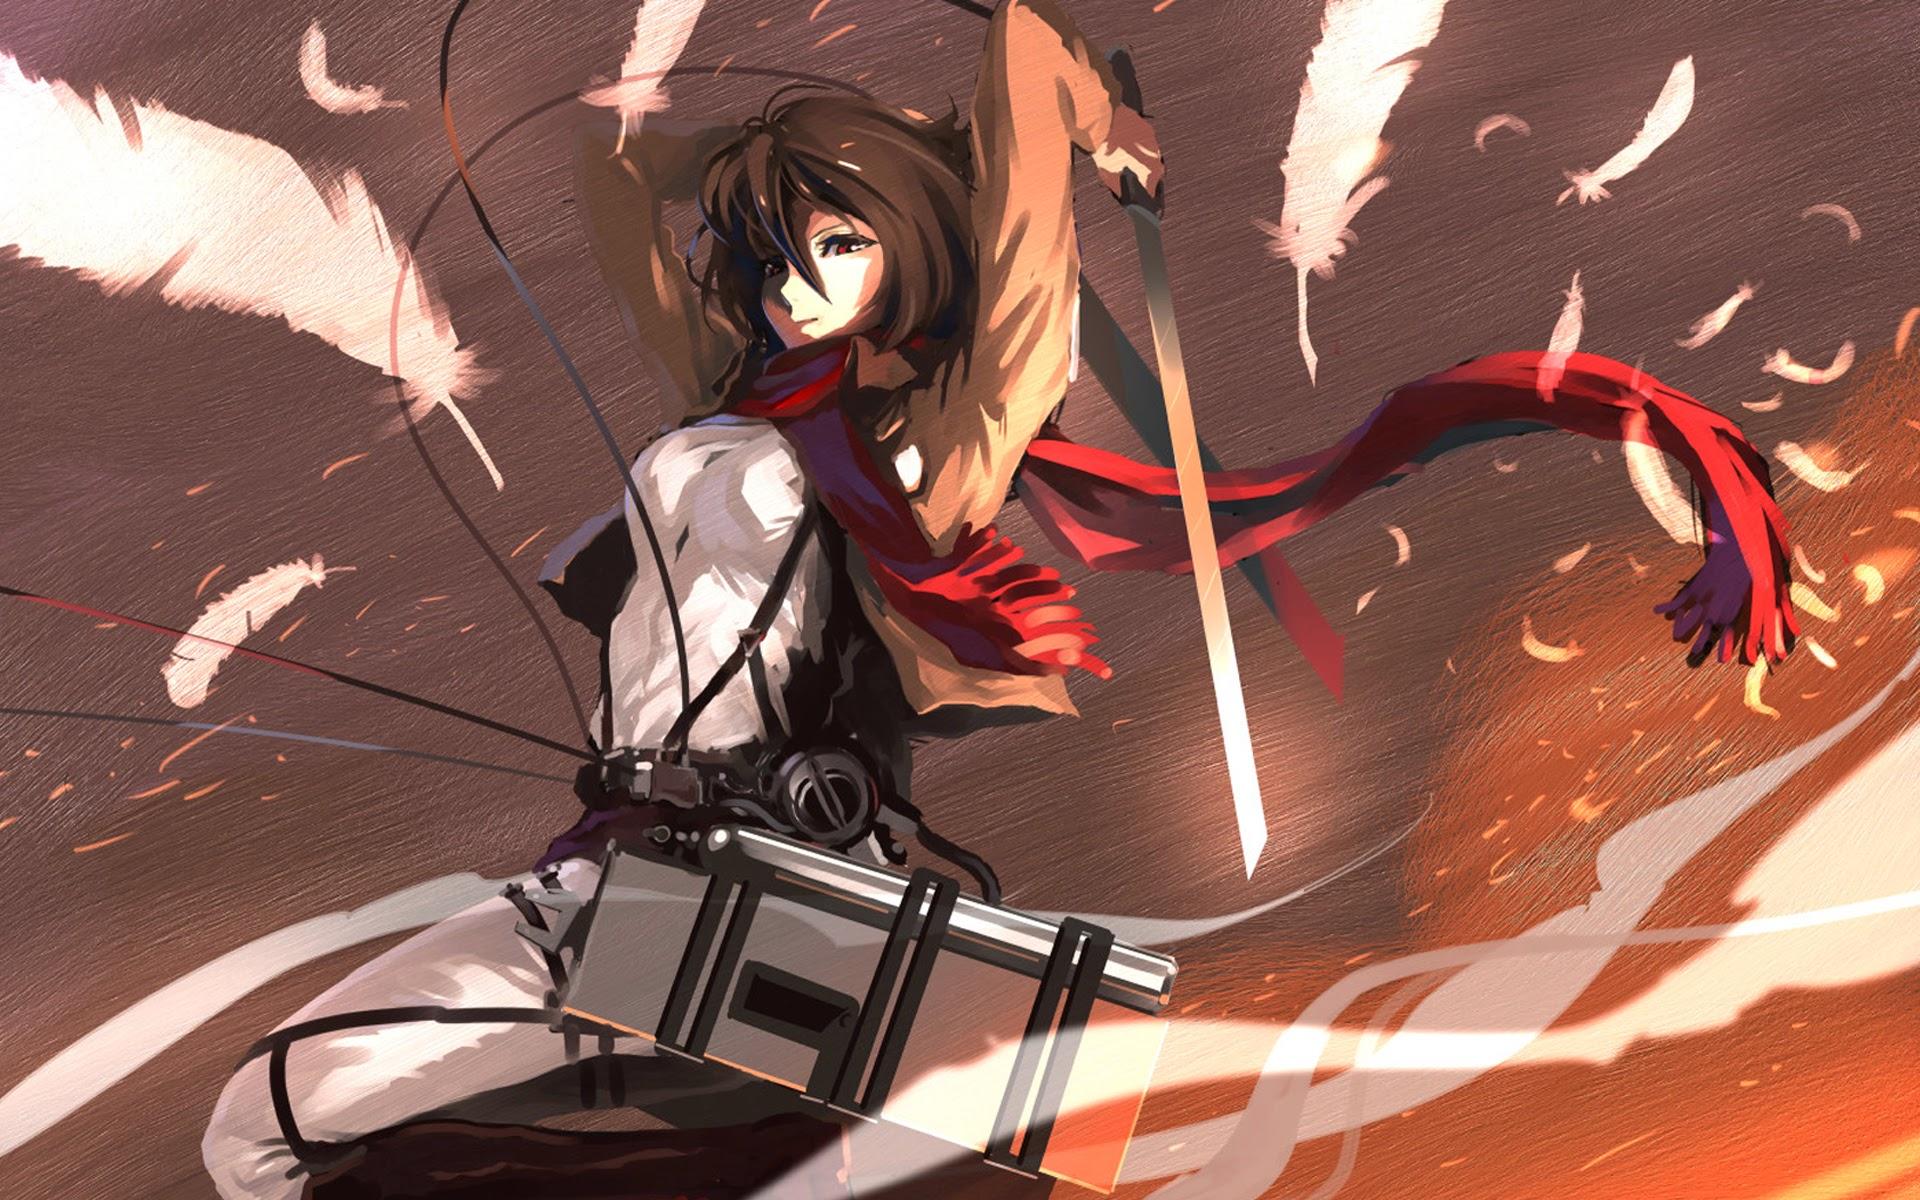 682073 Title Anime Attack On Titan Mikasa Ackerman Attack On Titan Wallpaper Mikasa And Eren 1920x1200 Download Hd Wallpaper Wallpapertip